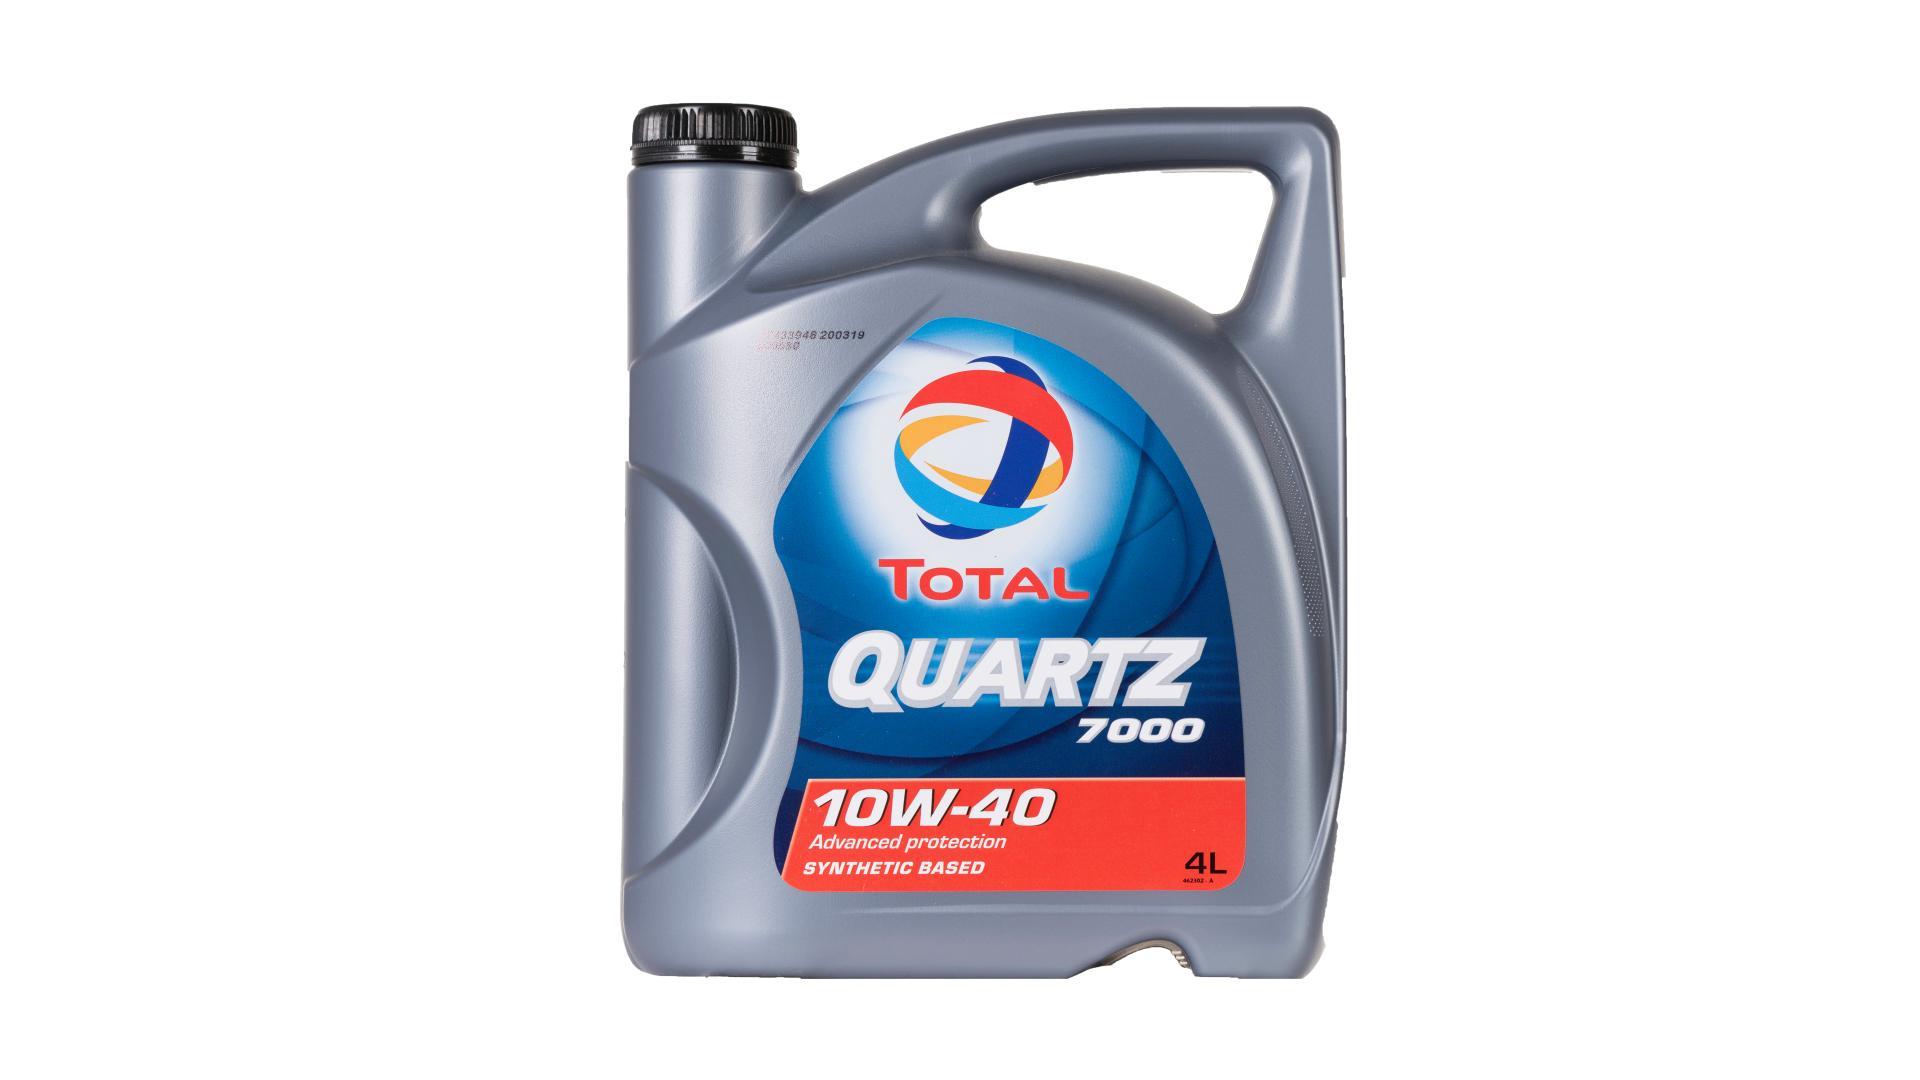 Total 10w-40 Quartz 7000 4L (201523)